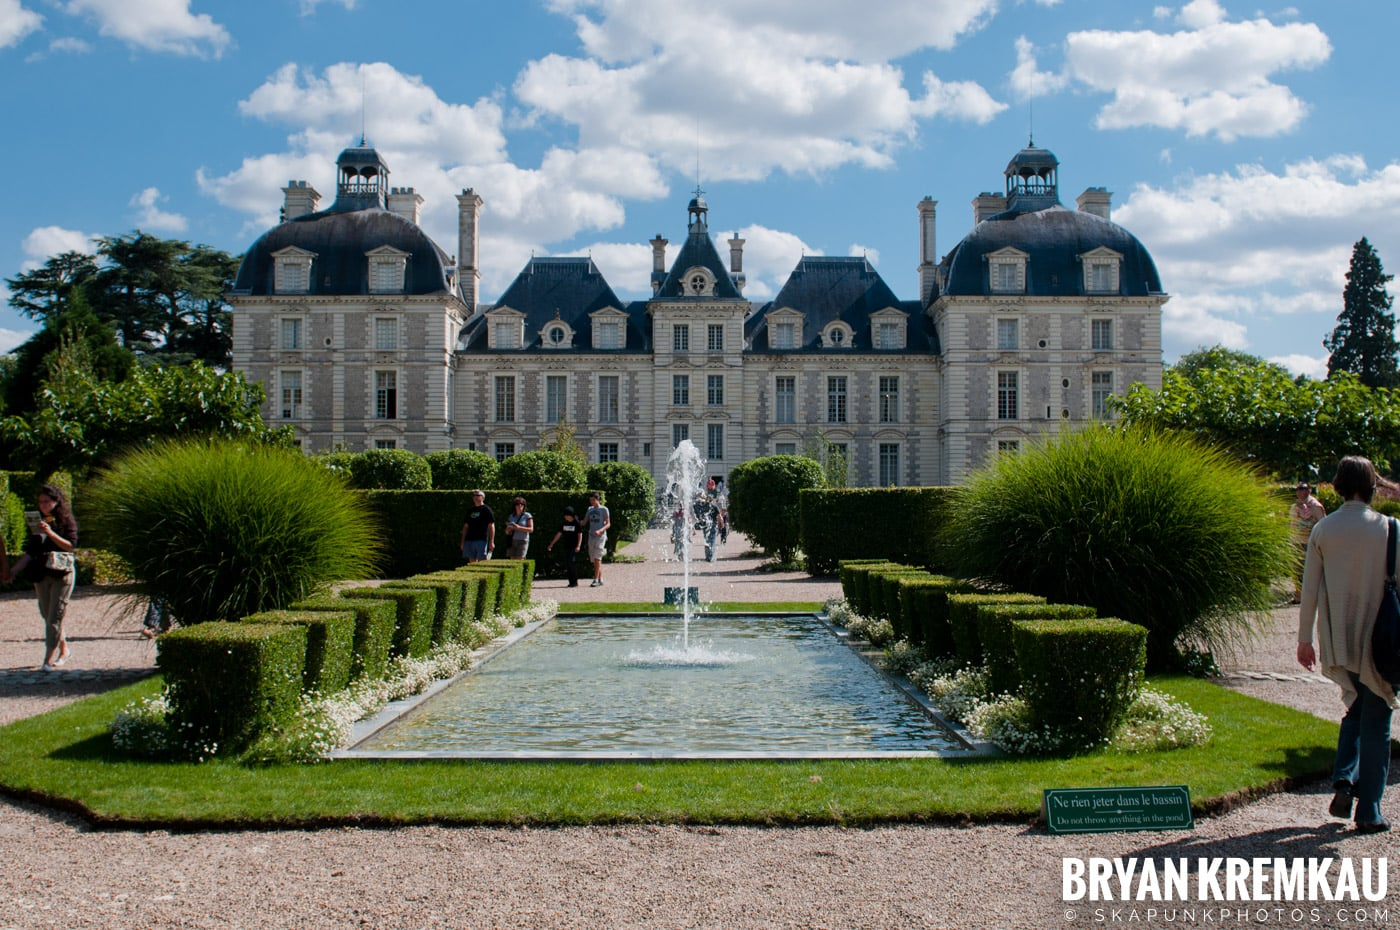 Paris, France Honeymoon - Day 7 - 7.24.11 (5)